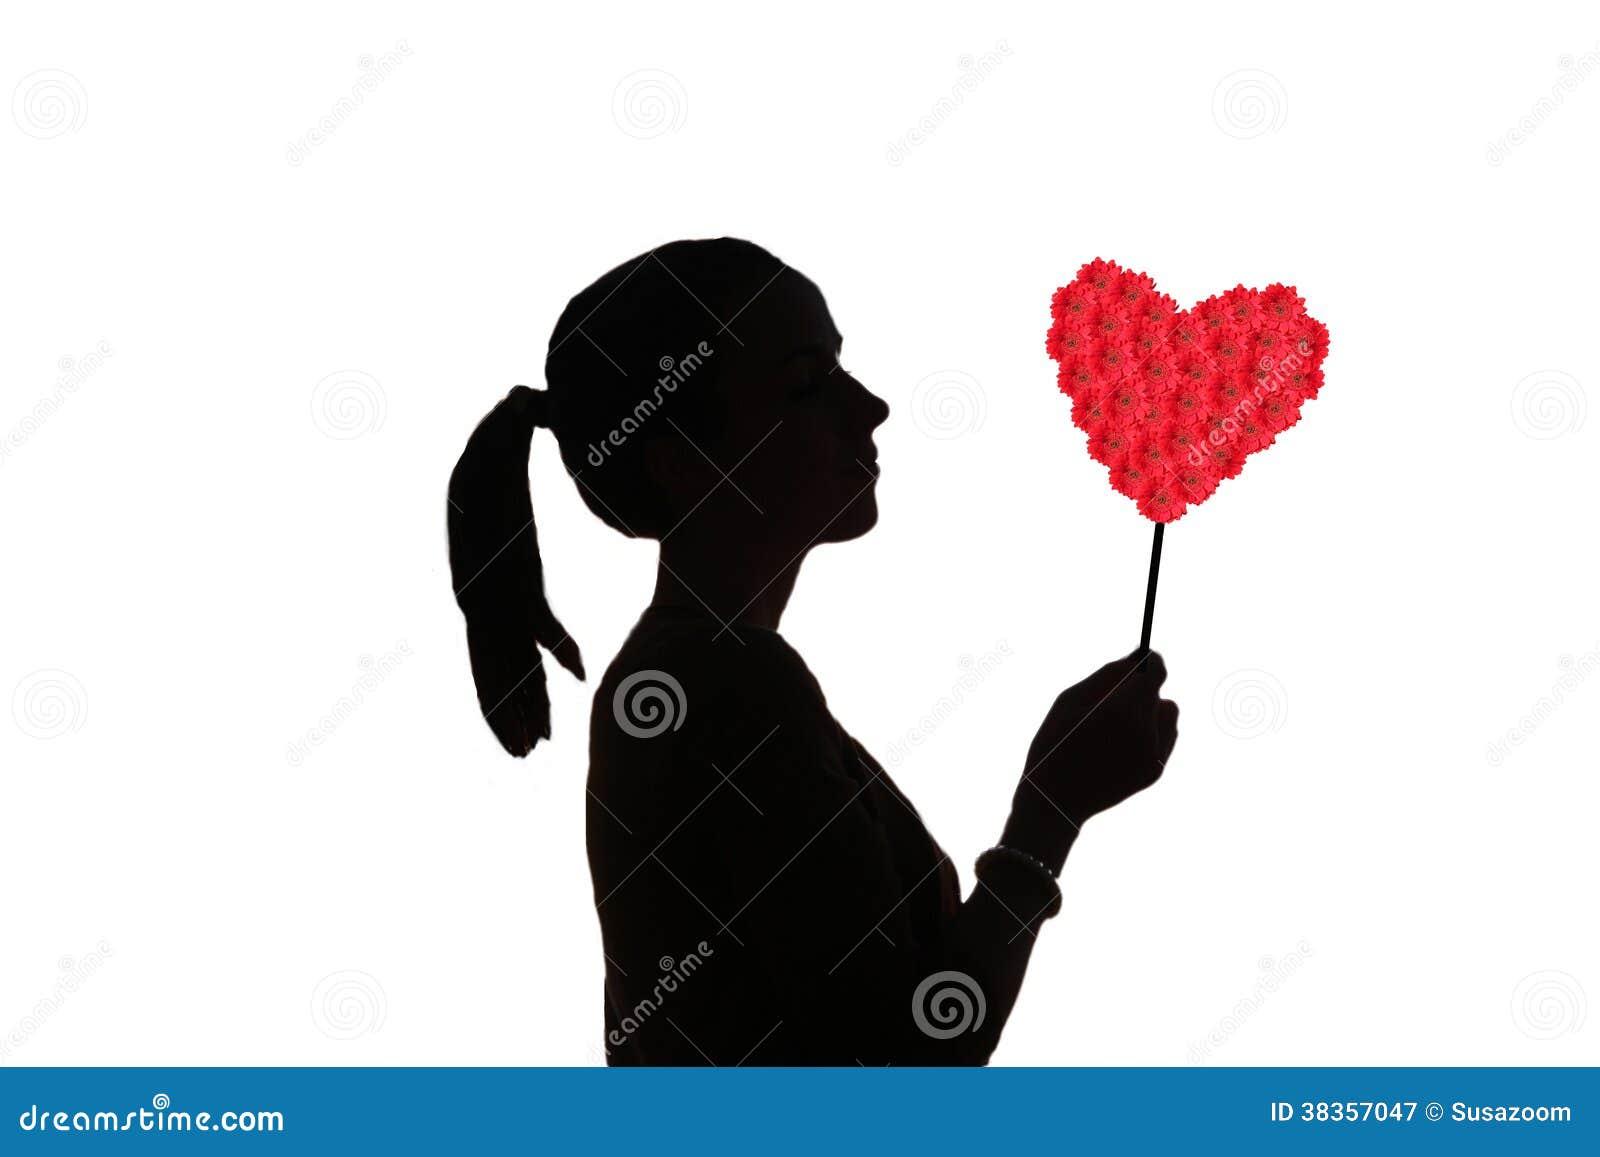 Free Heart Silhouette Clip Art